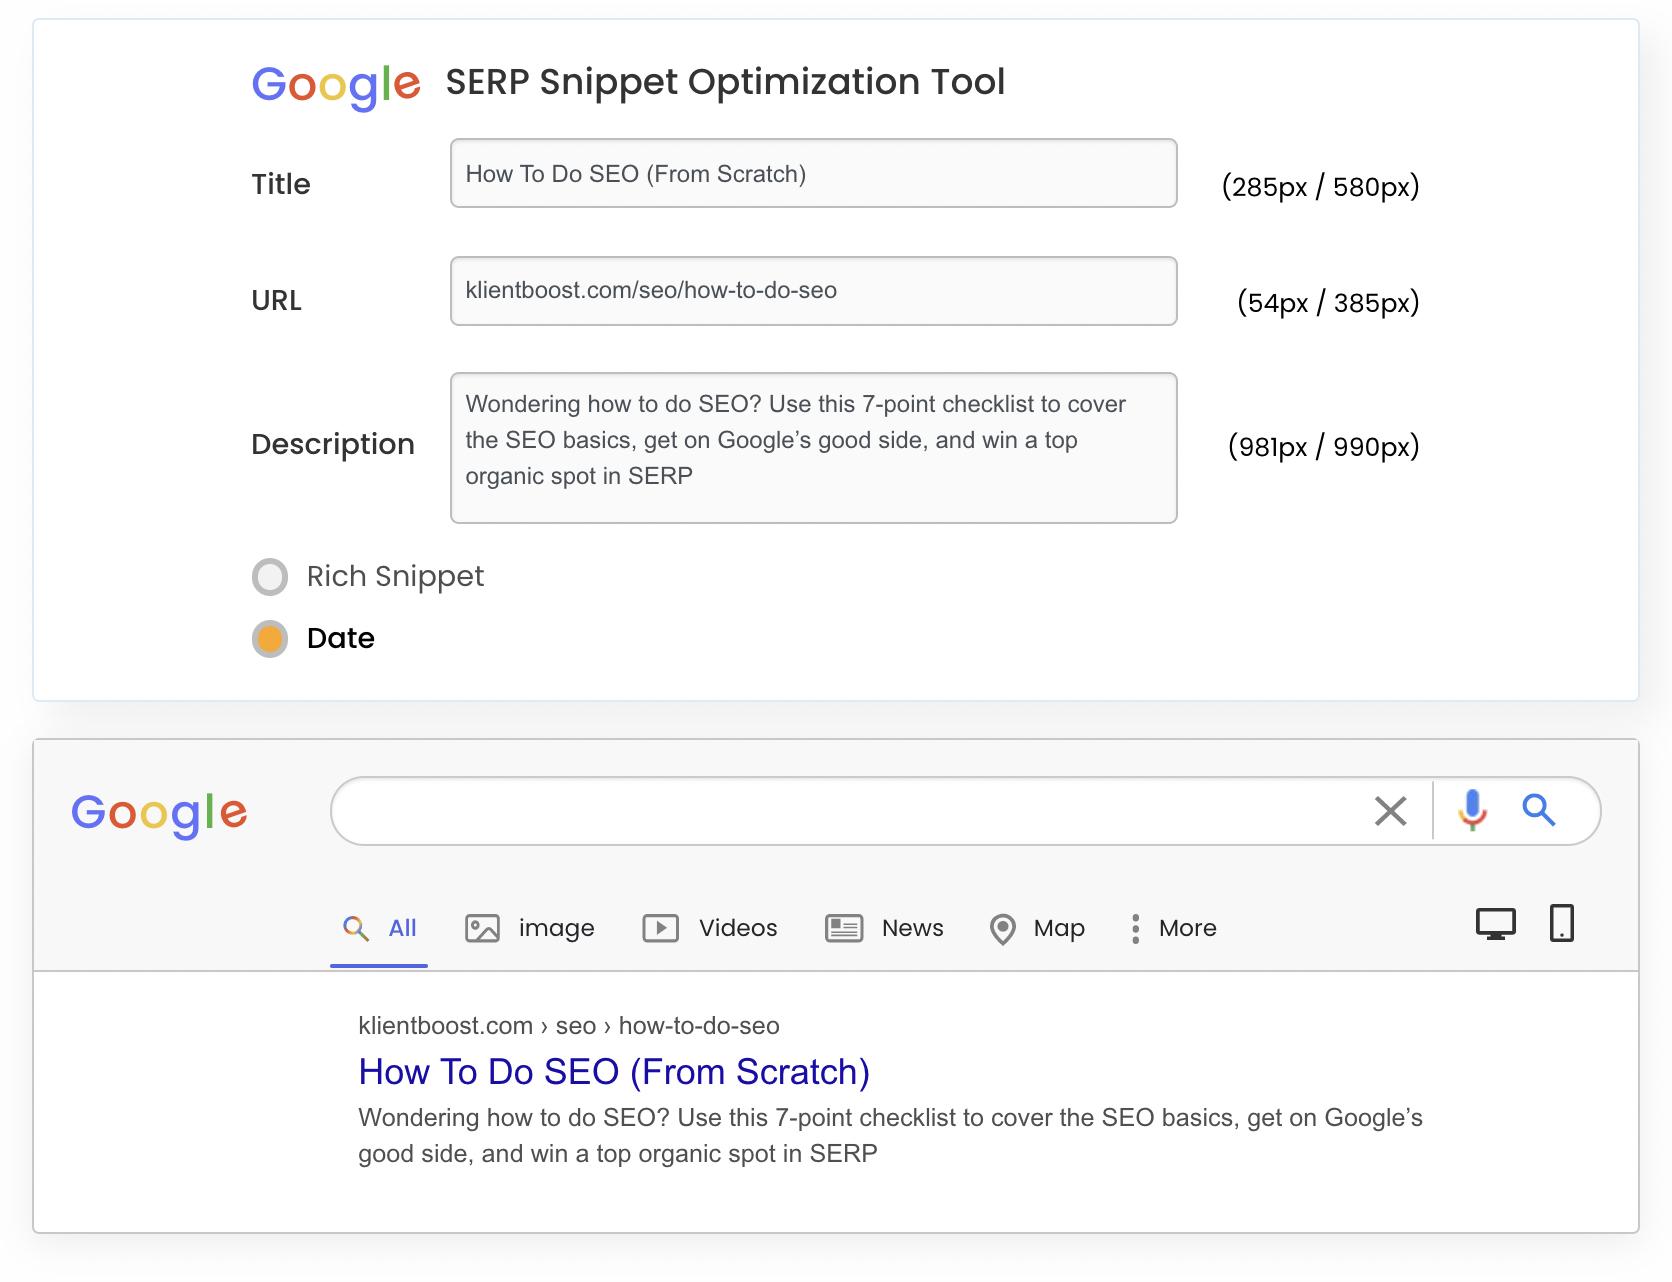 SERP snippet tool